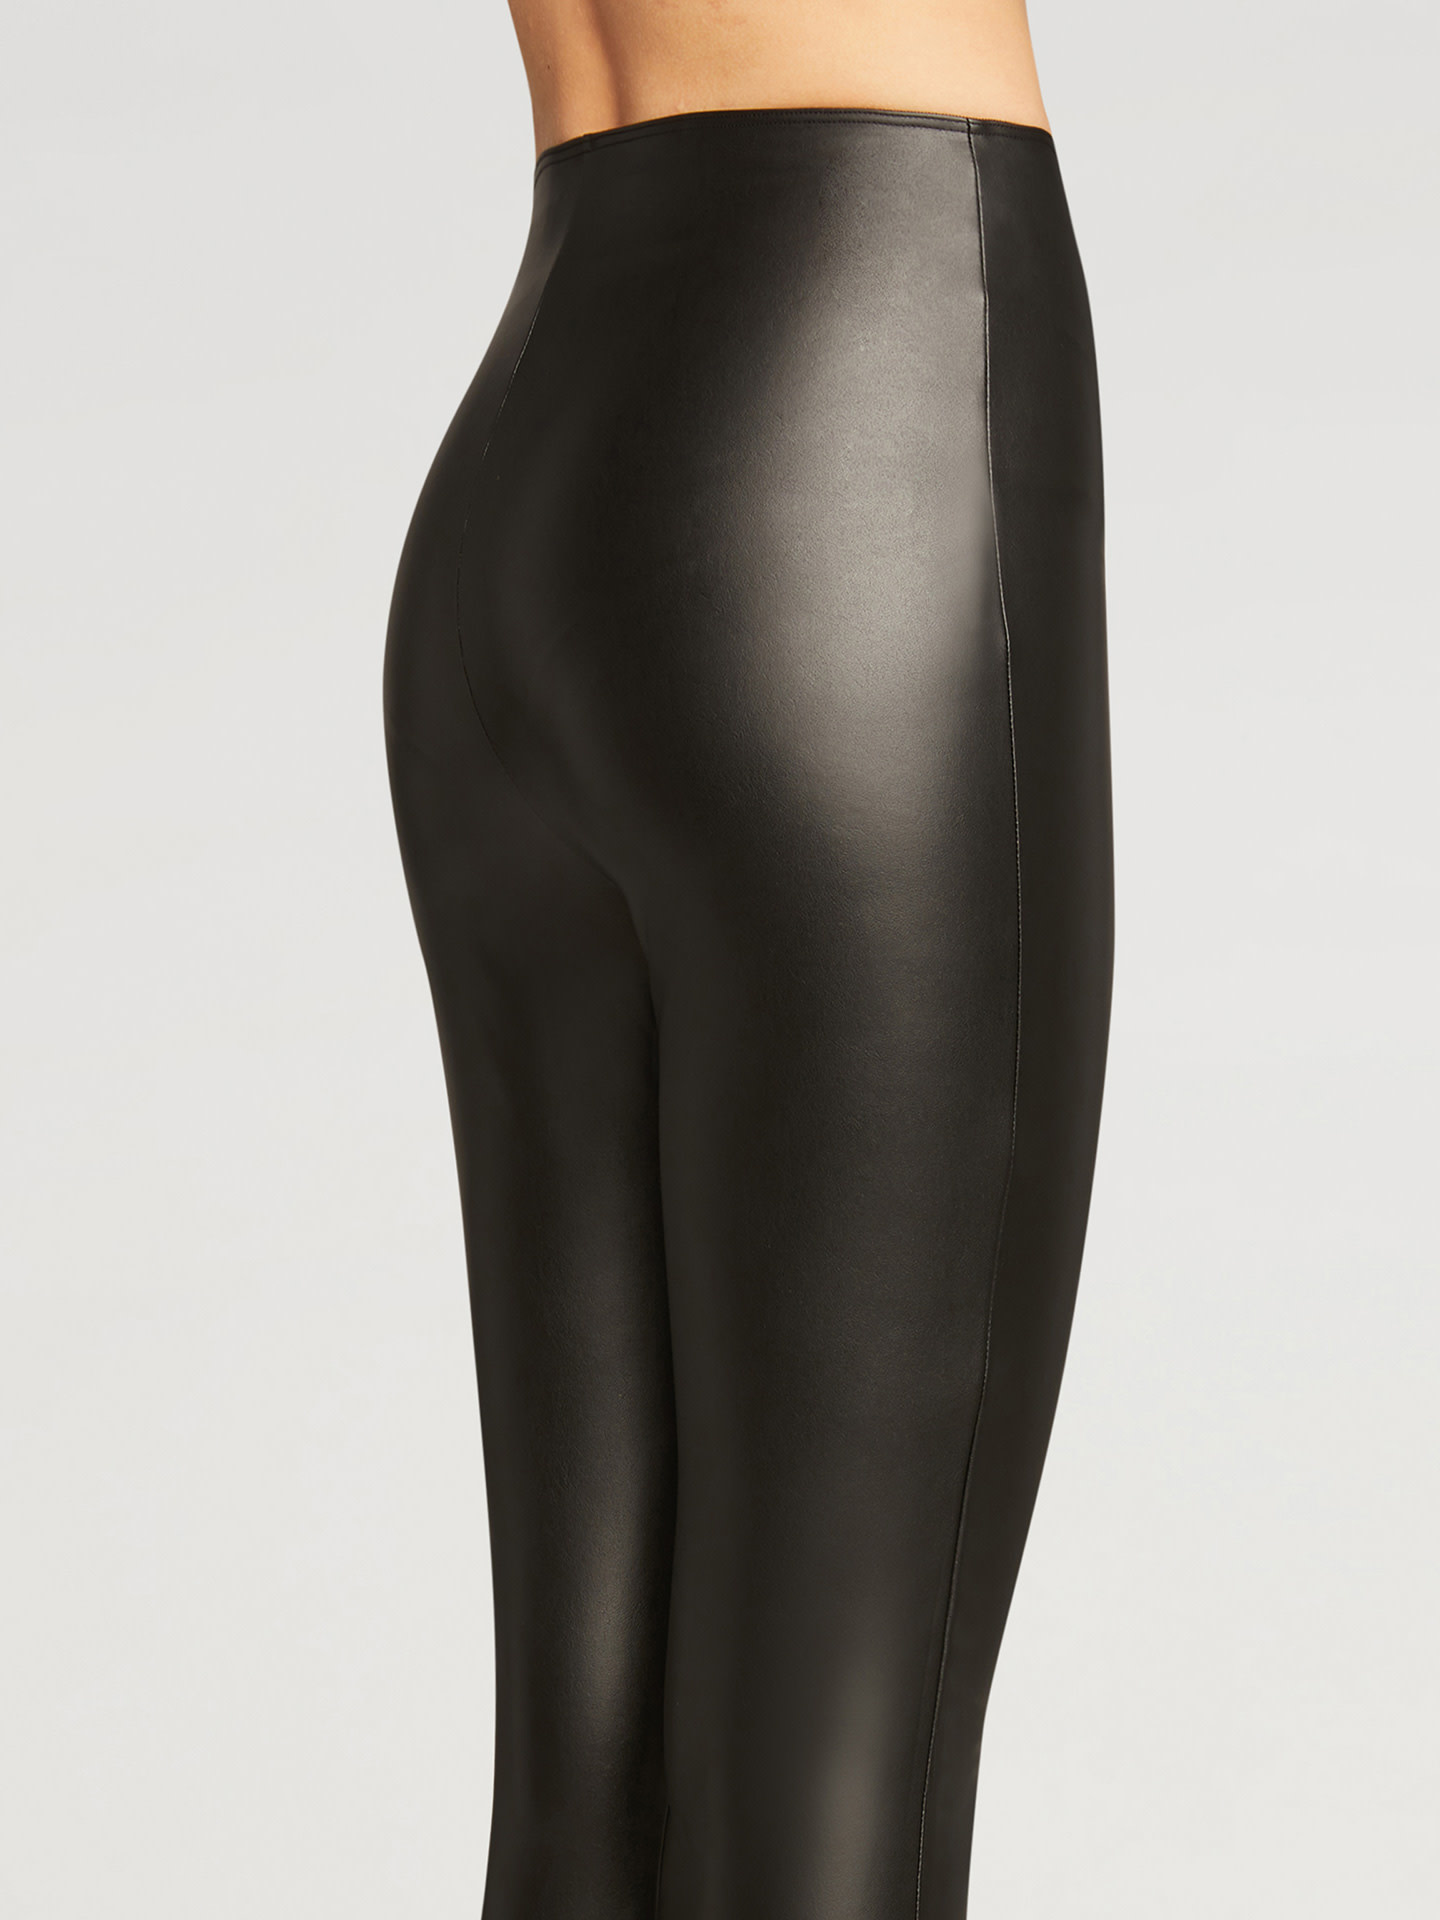 WOLFORD 19337 Vegan Leather Stirrup